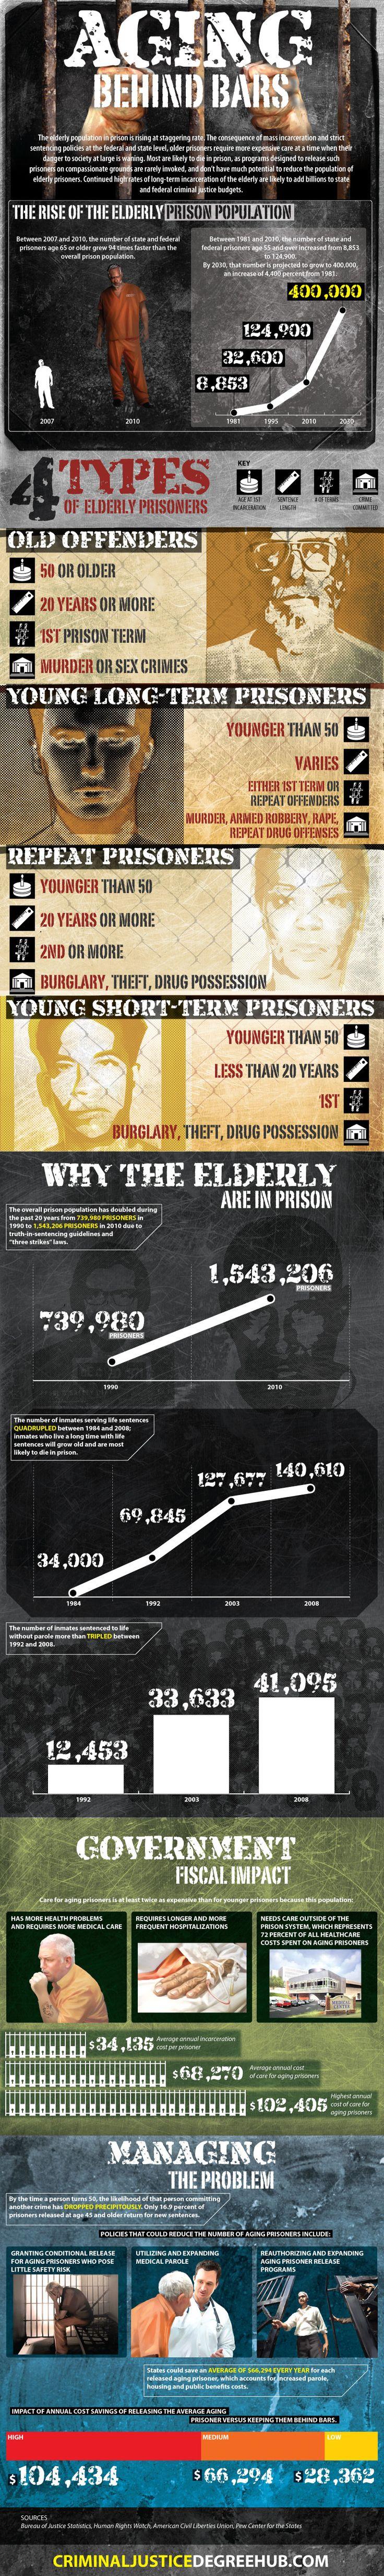 Aging Behind Bars at Criminal Justice Degree Hub  http://www.criminaljusticedegree...    Prepare for a career in criminal justice